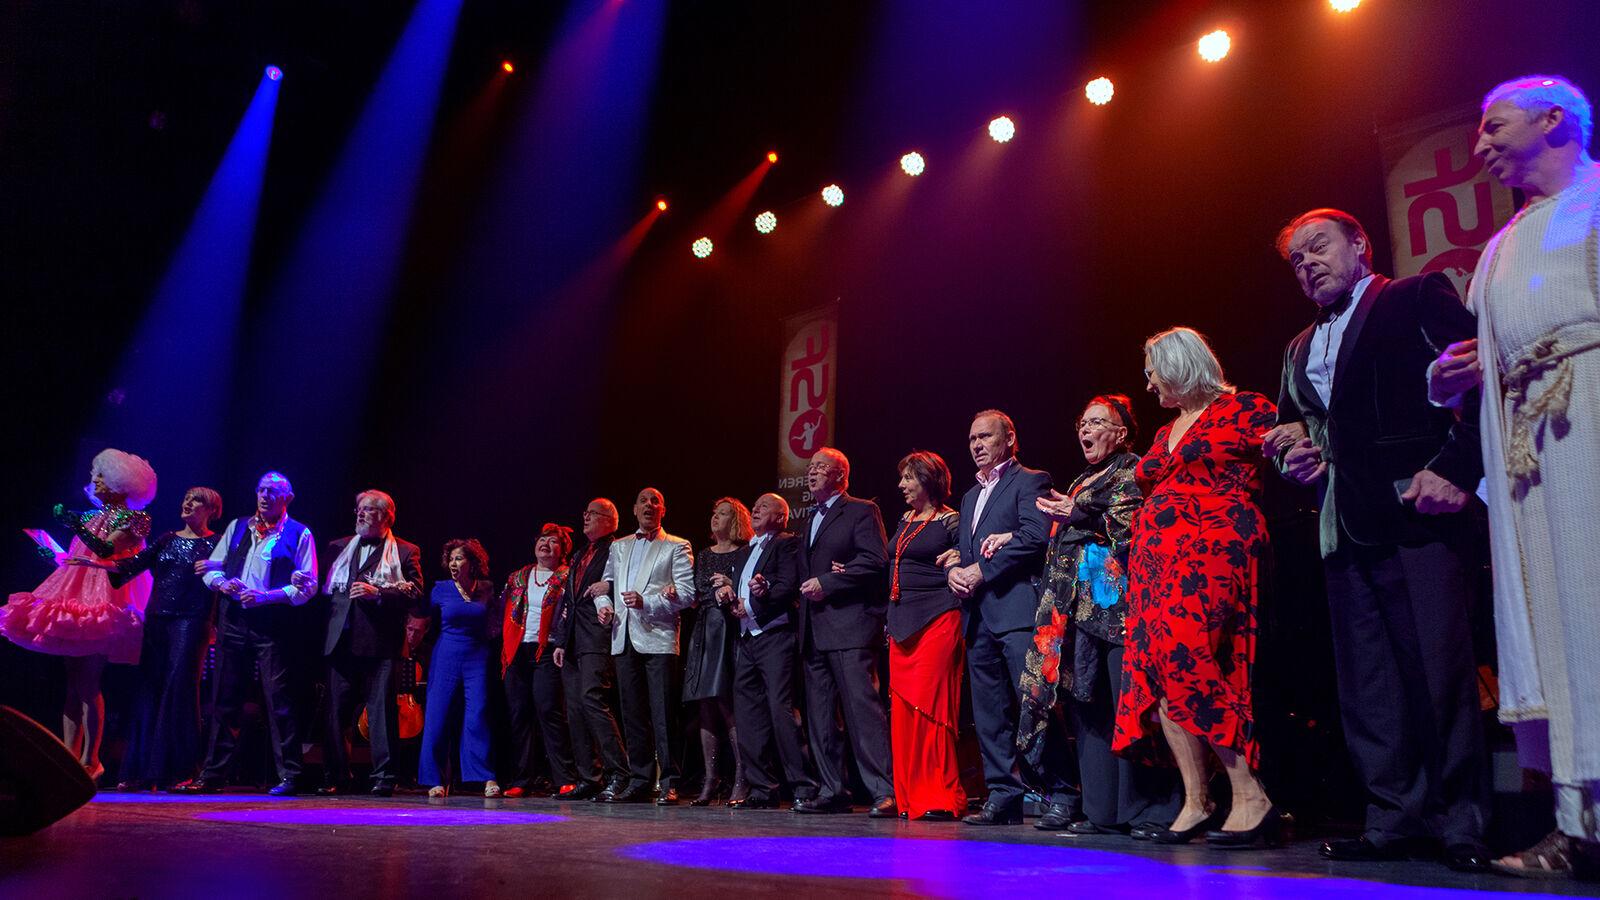 Ouderen Songfestival 2019: PRE-FINALE 1